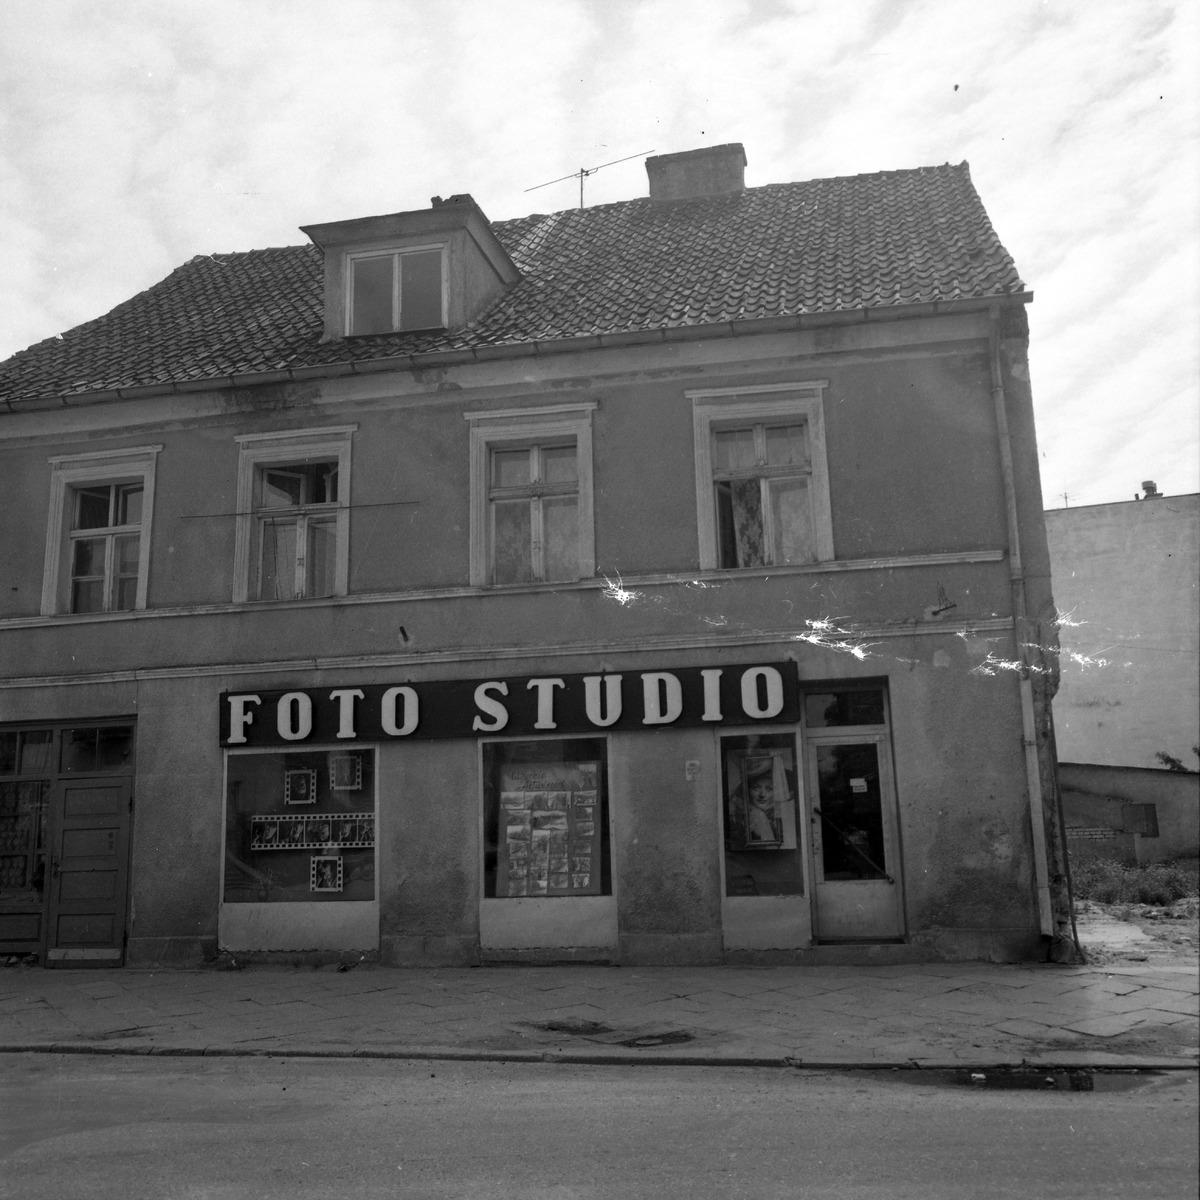 Foto Studio [1]